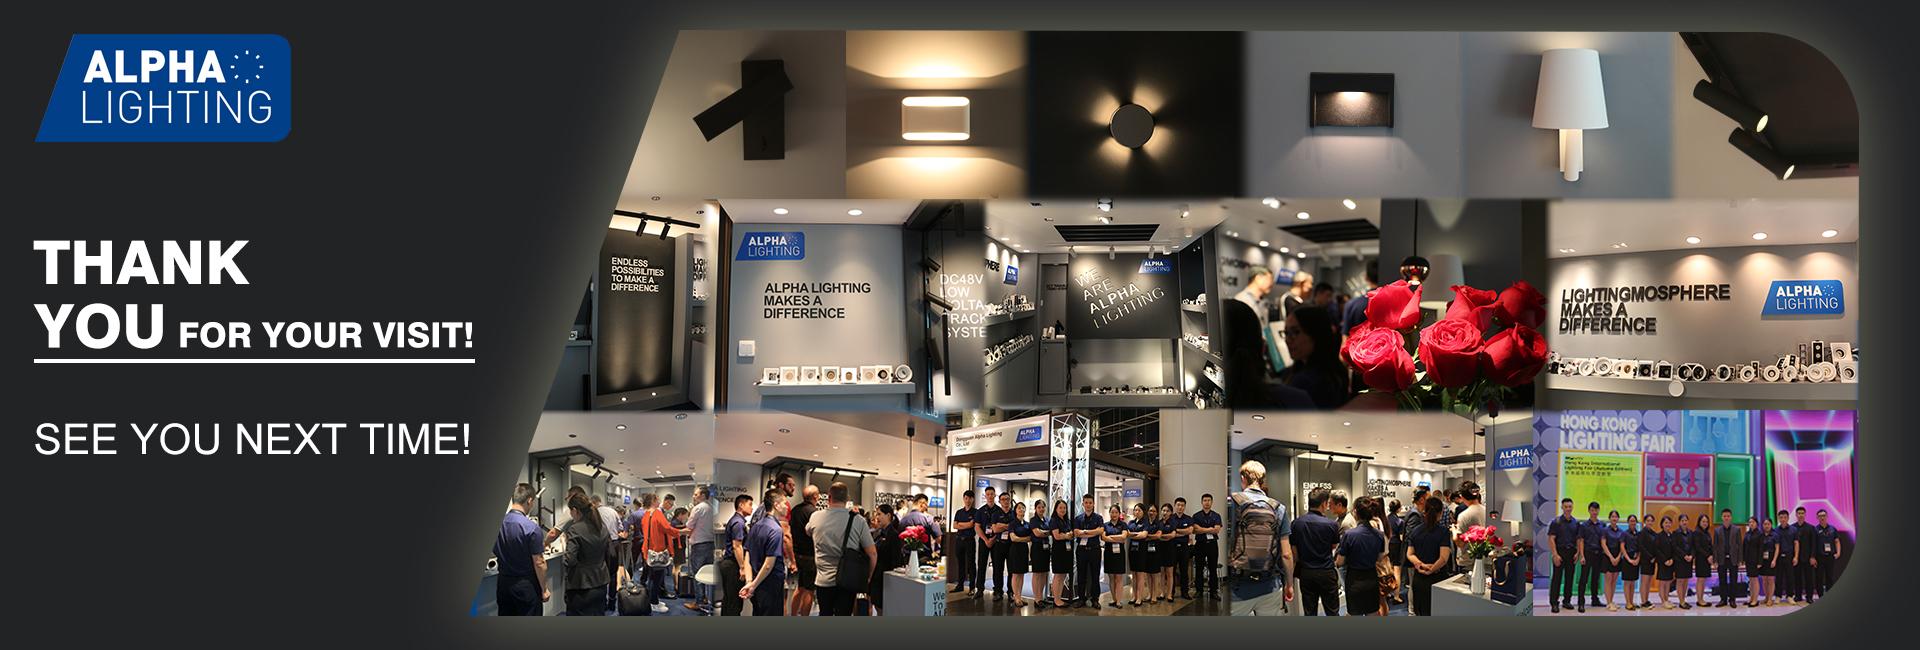 the 21st Hong Kong International Autumn lighting exhibition